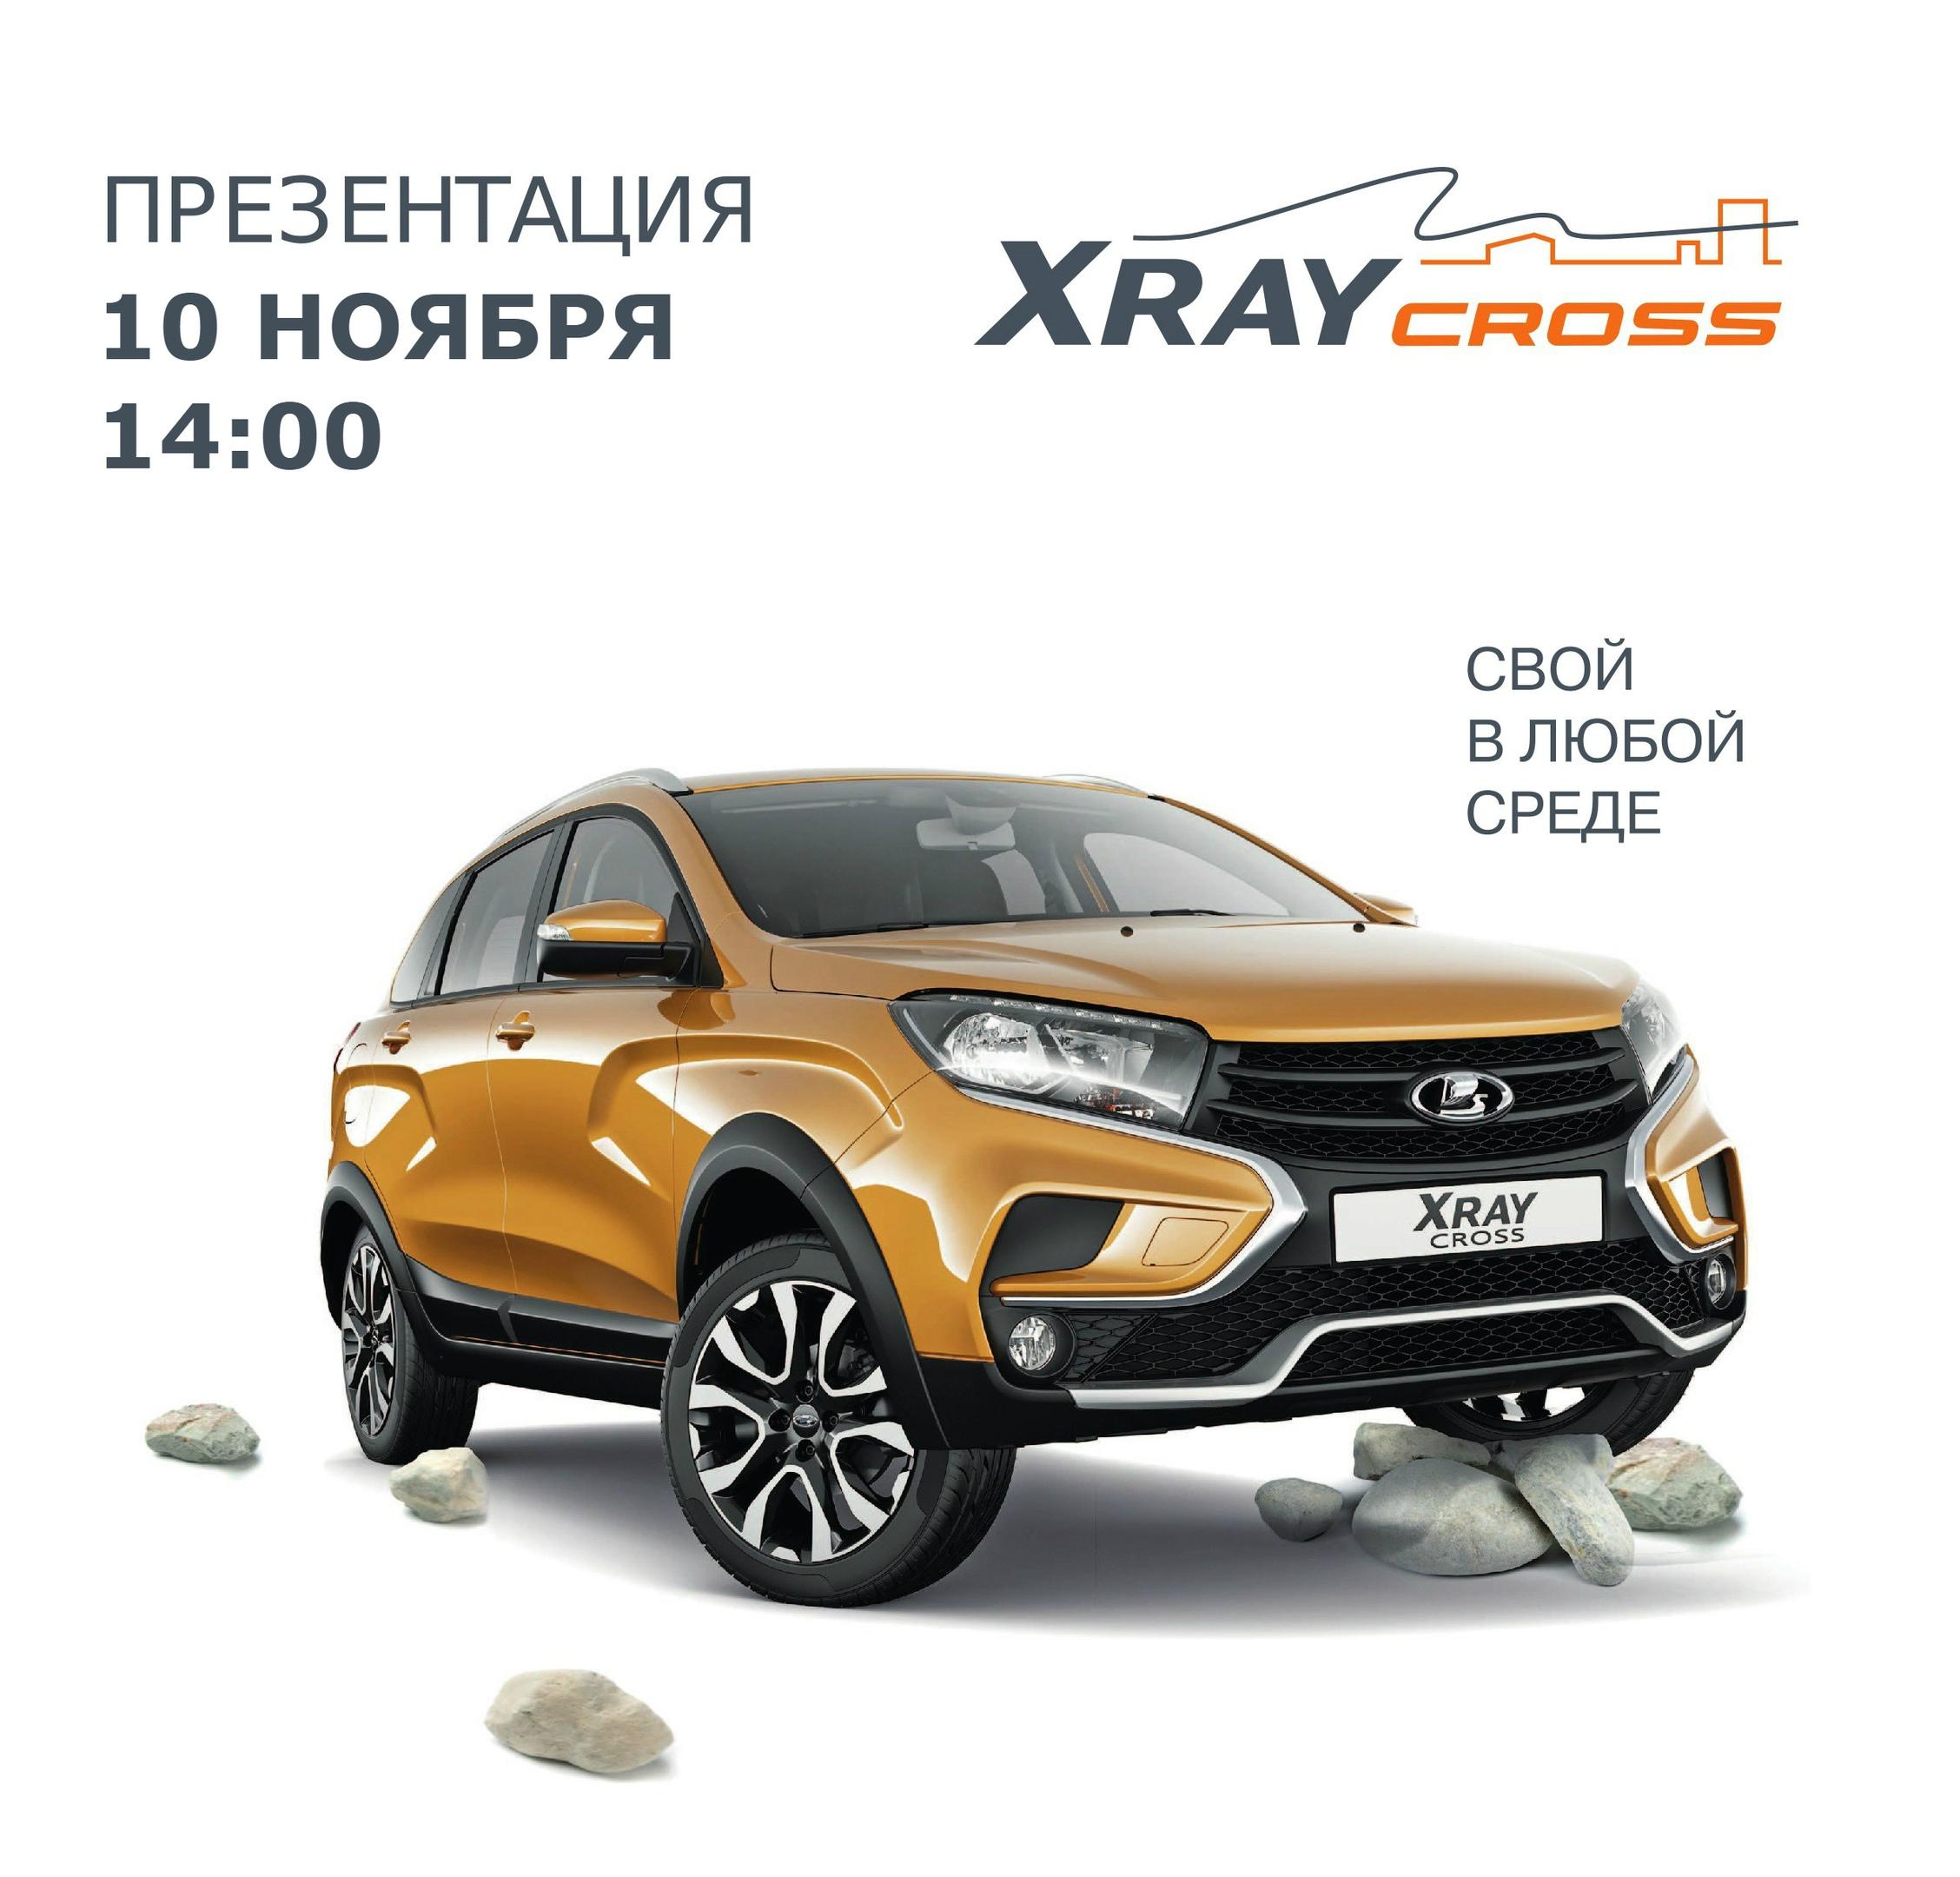 10 ноября в 14:00 презентация#LADAXRAYCROSSв Астрахани!